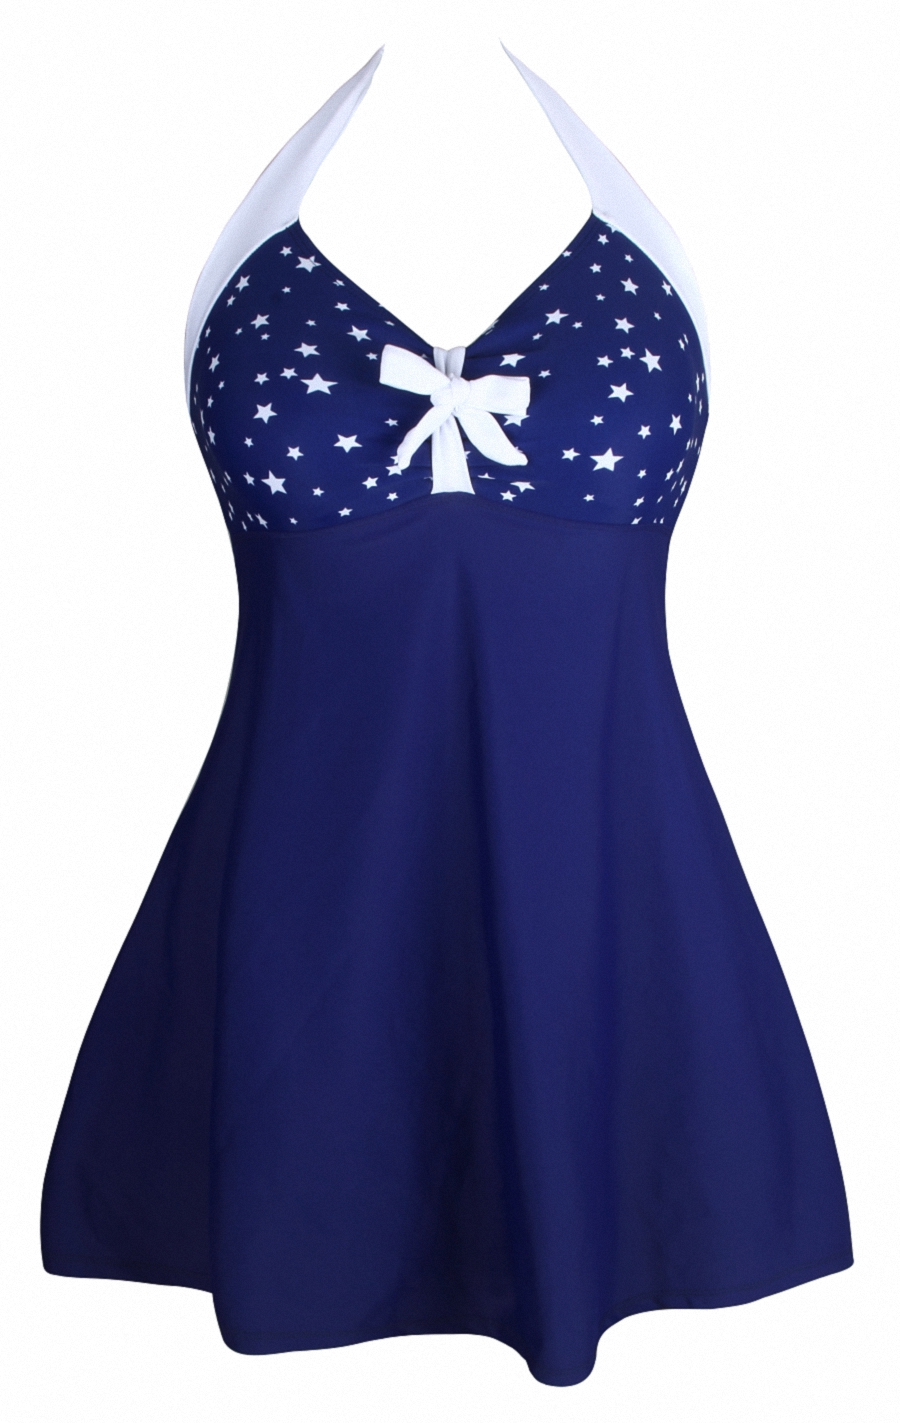 One-piece Swimdress Stylish Women Lacing Bow Skirted Swimsuit Beachwear Cover-Ups Dress Bathingsuit Summer Playsuit